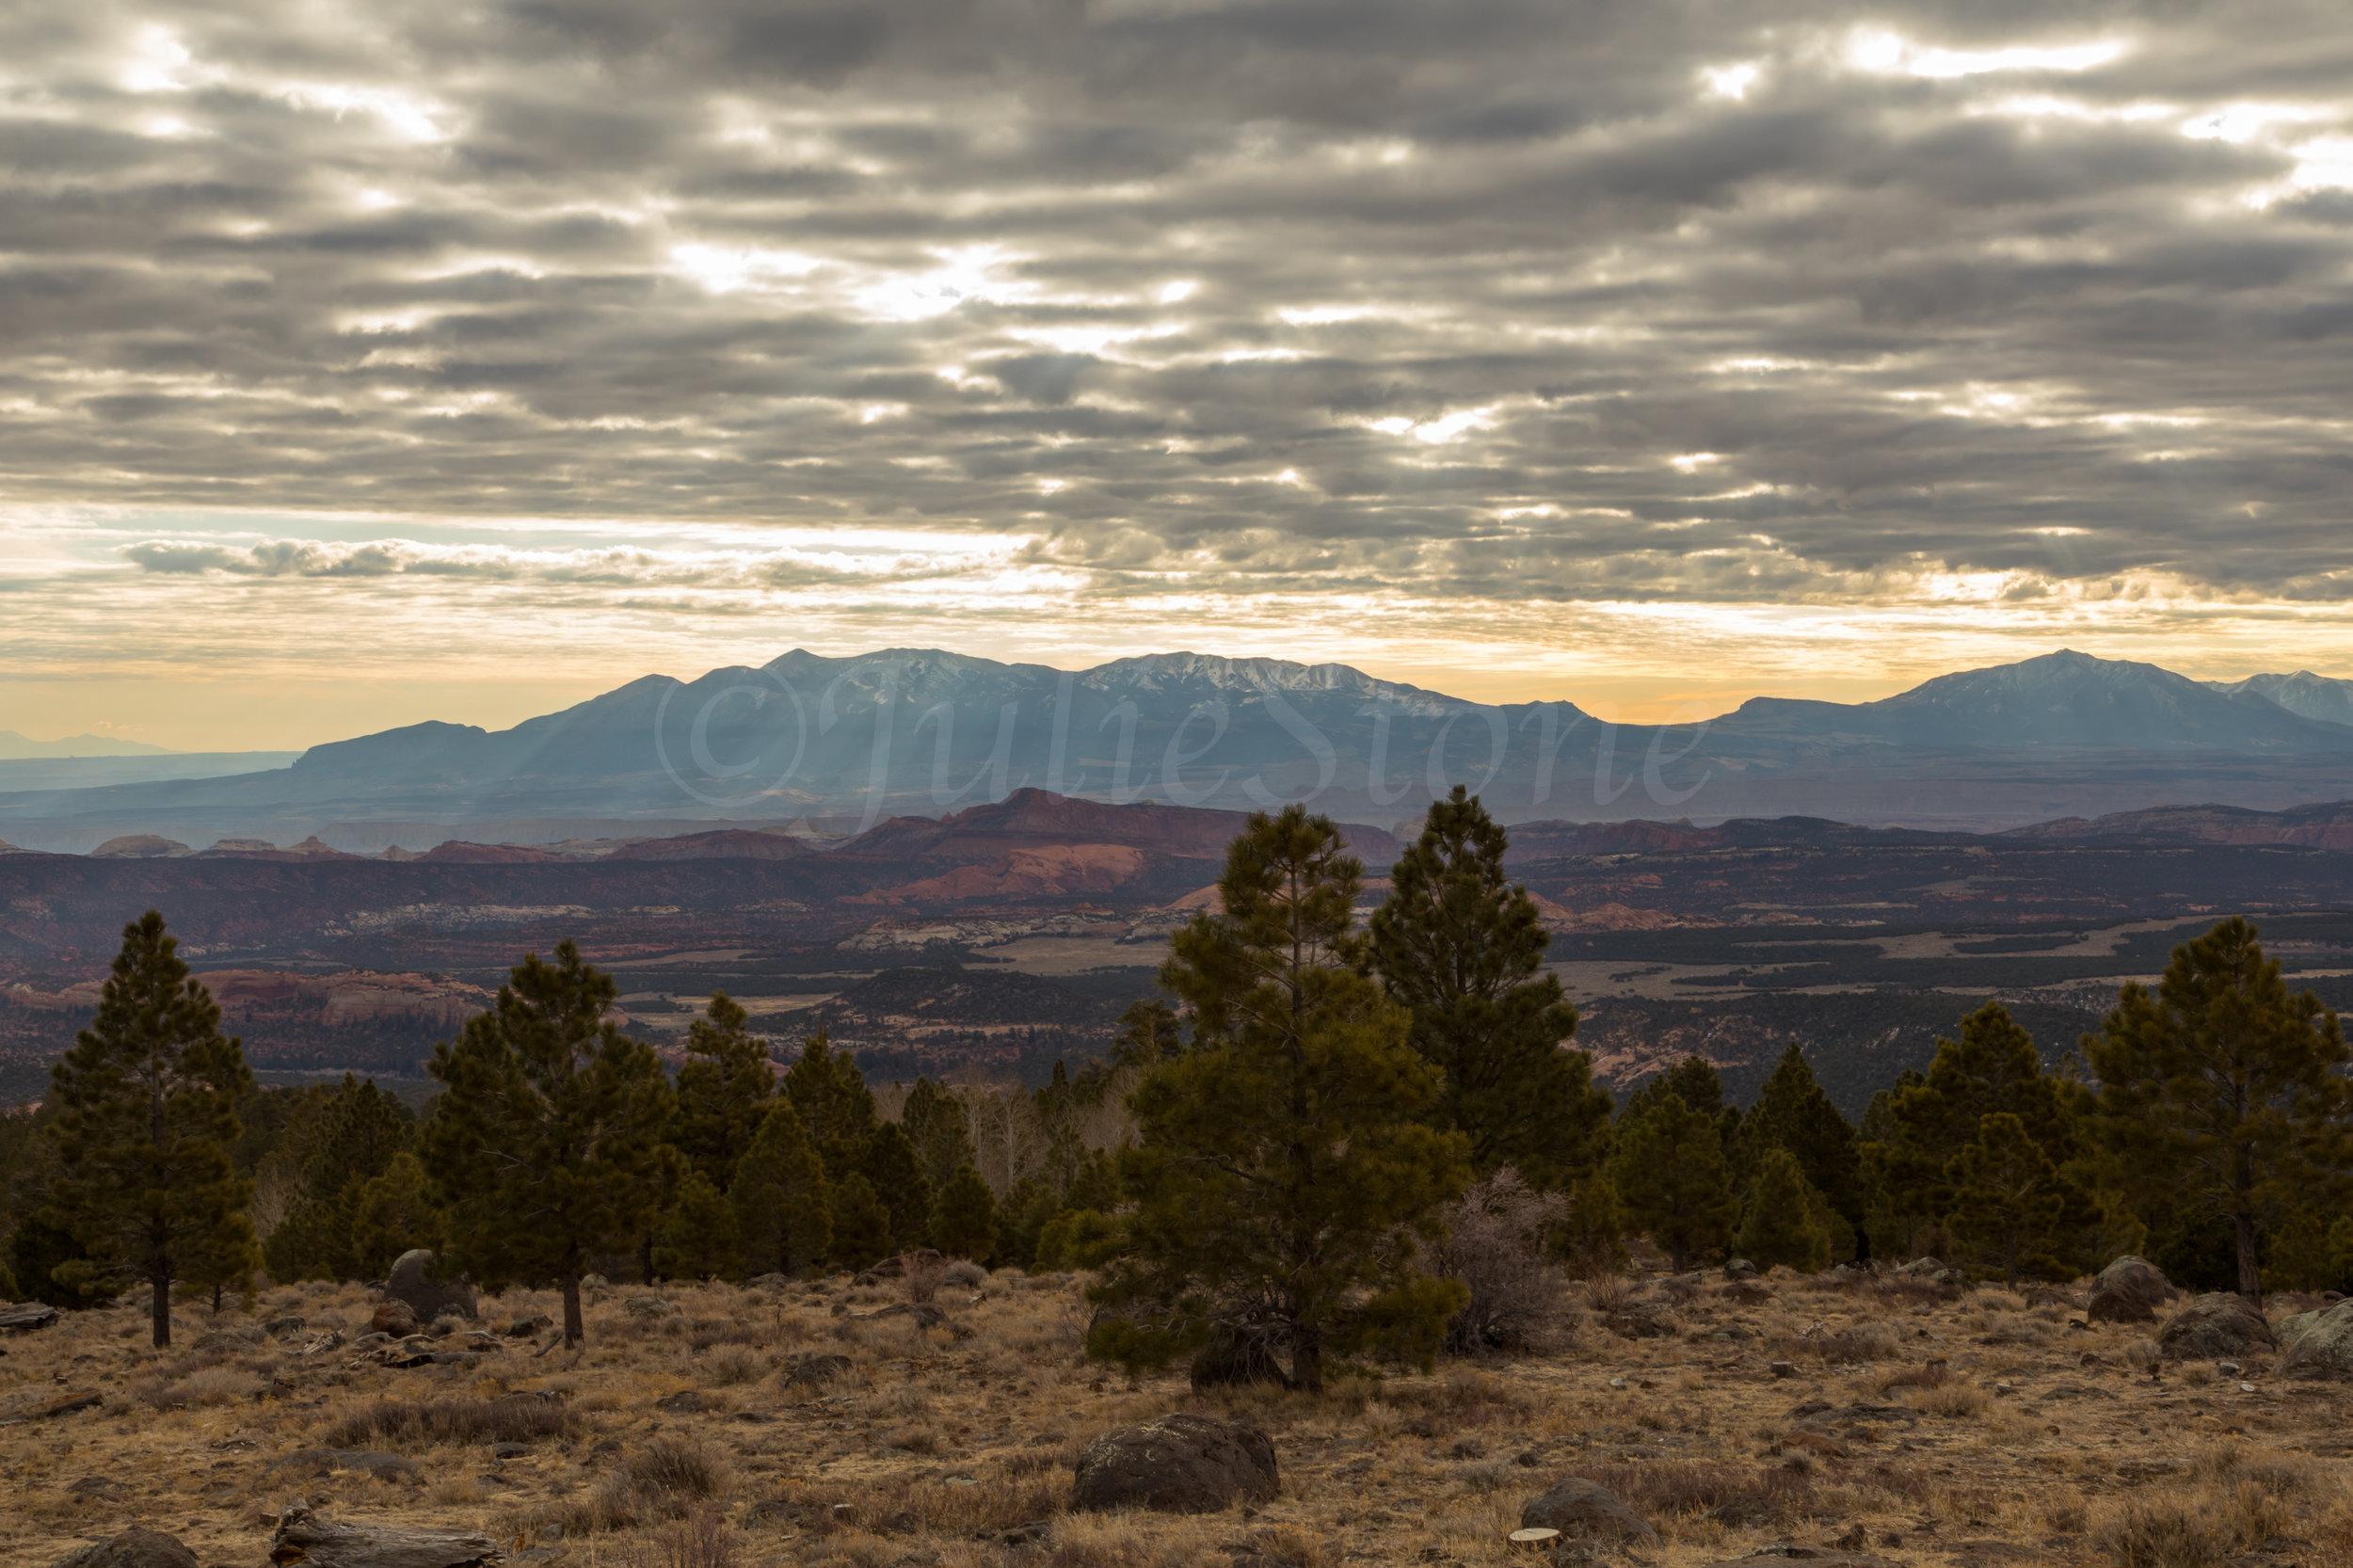 Boulder Mountain Pass, Image # 6722